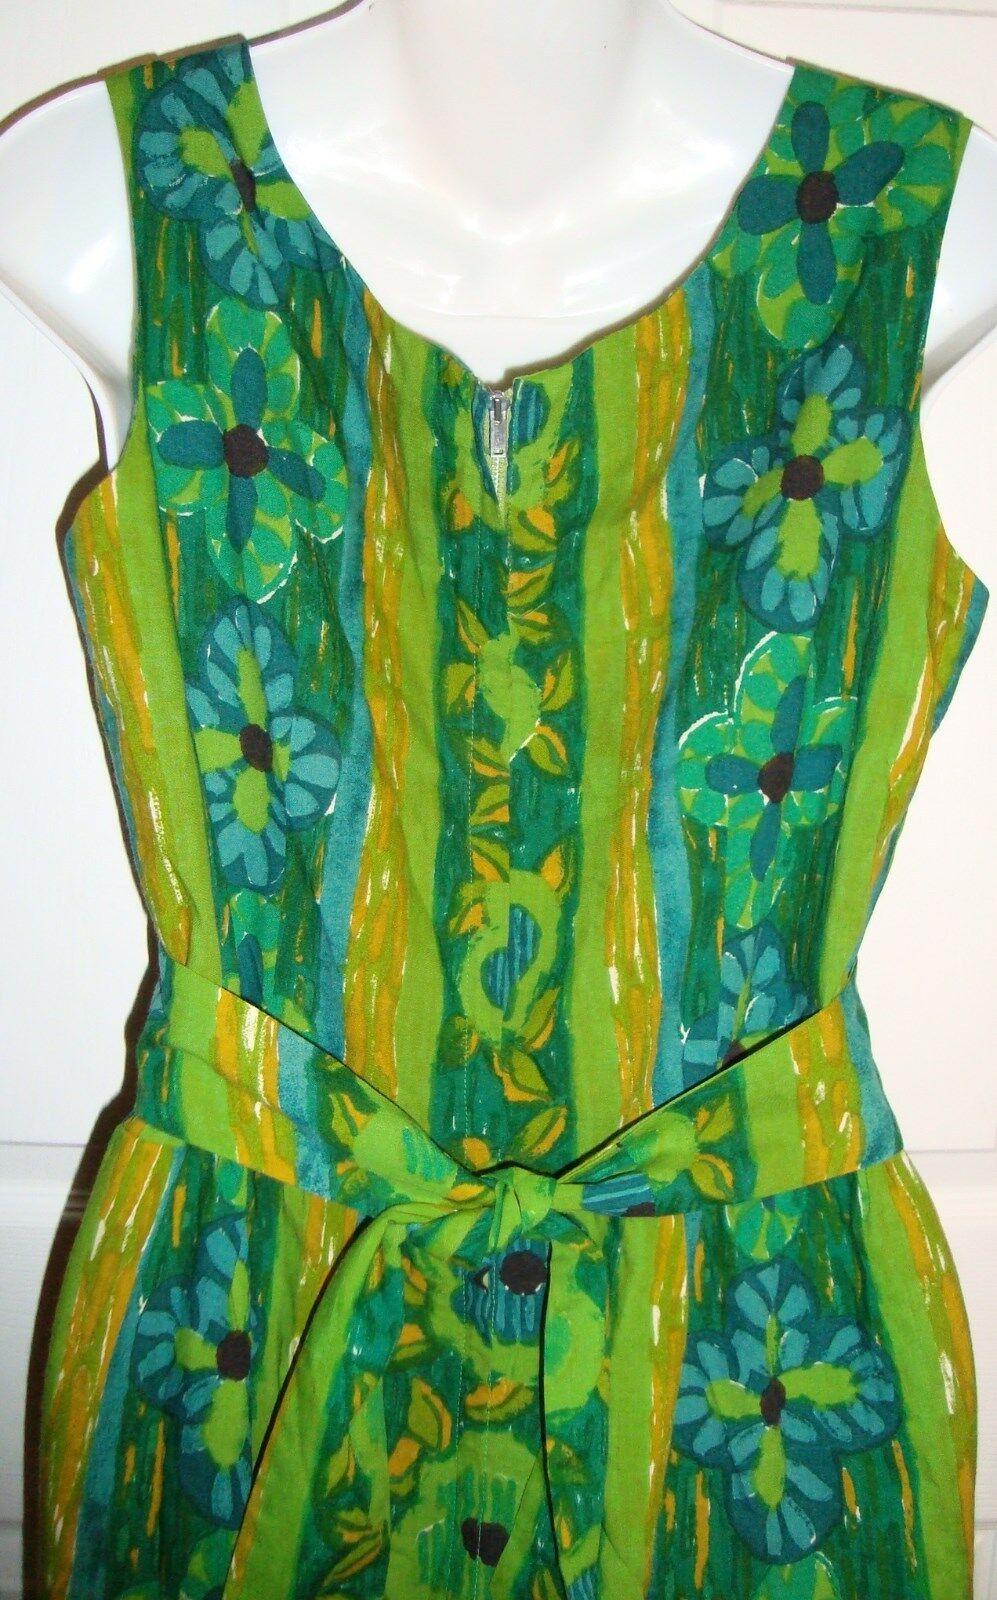 Ja Na Hawaii Hawaiian Dress Tapa Print Medium Large Grün Blau Gold Floral VTG